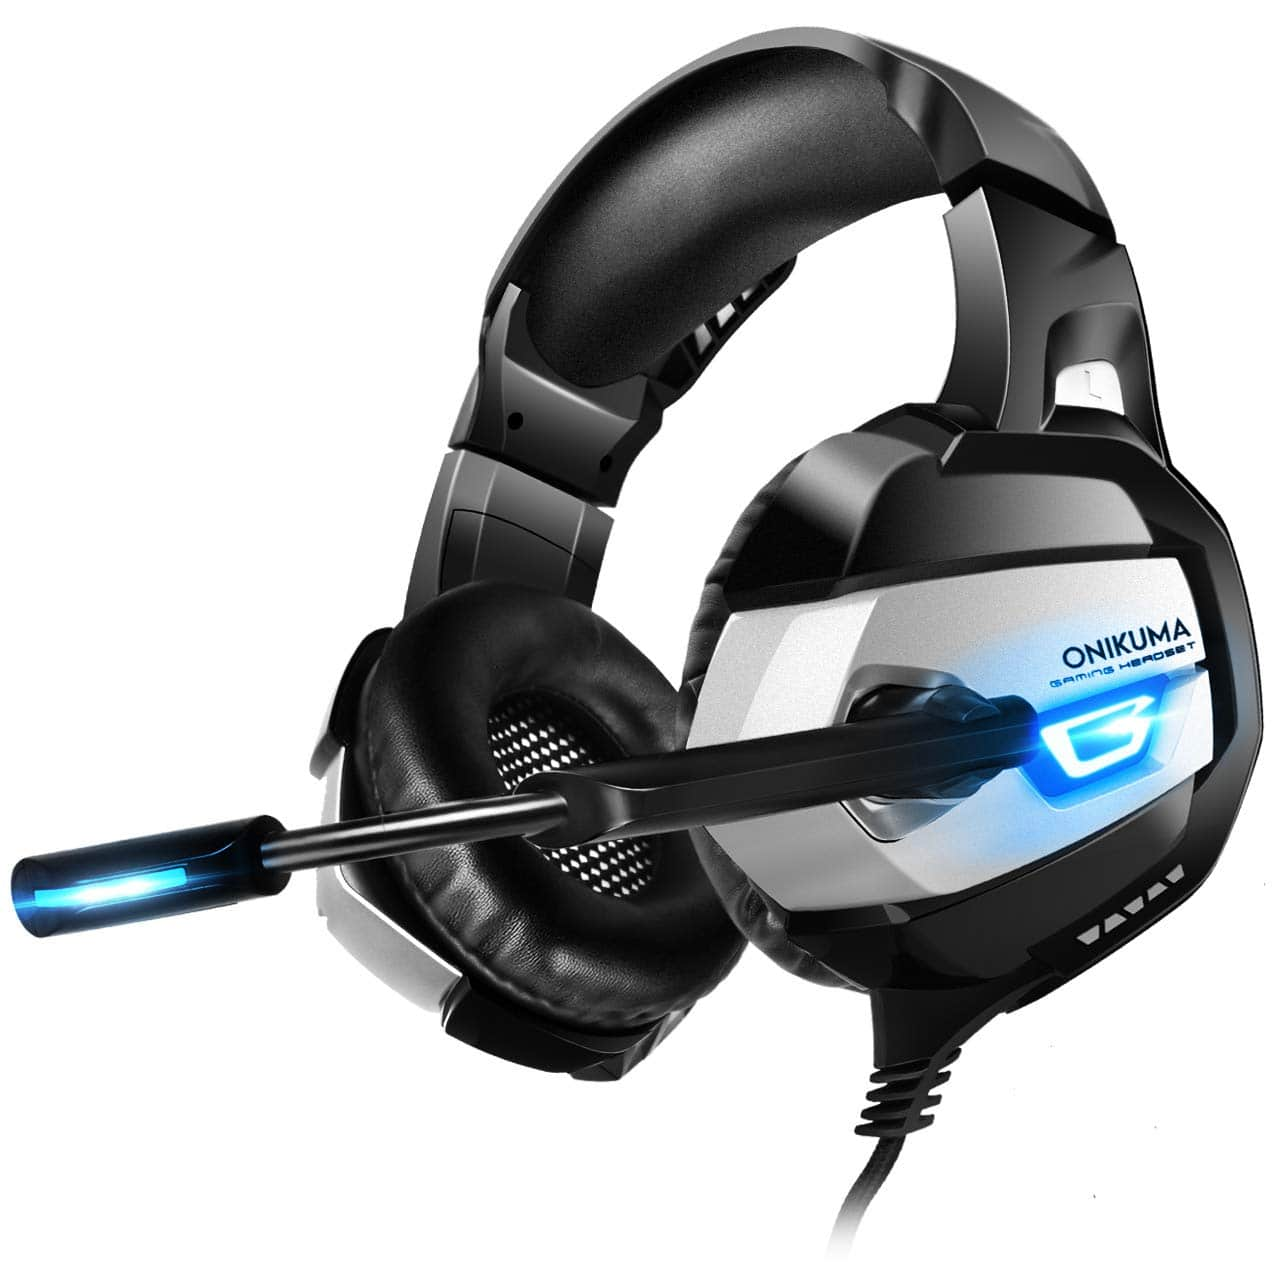 ONIKUMA Gaming Headset Xbox One Headset Upgrade PS4 Headset [2019 K5 Pro] with Noise Canceling Mic &7.1 Surround Bass $14.44